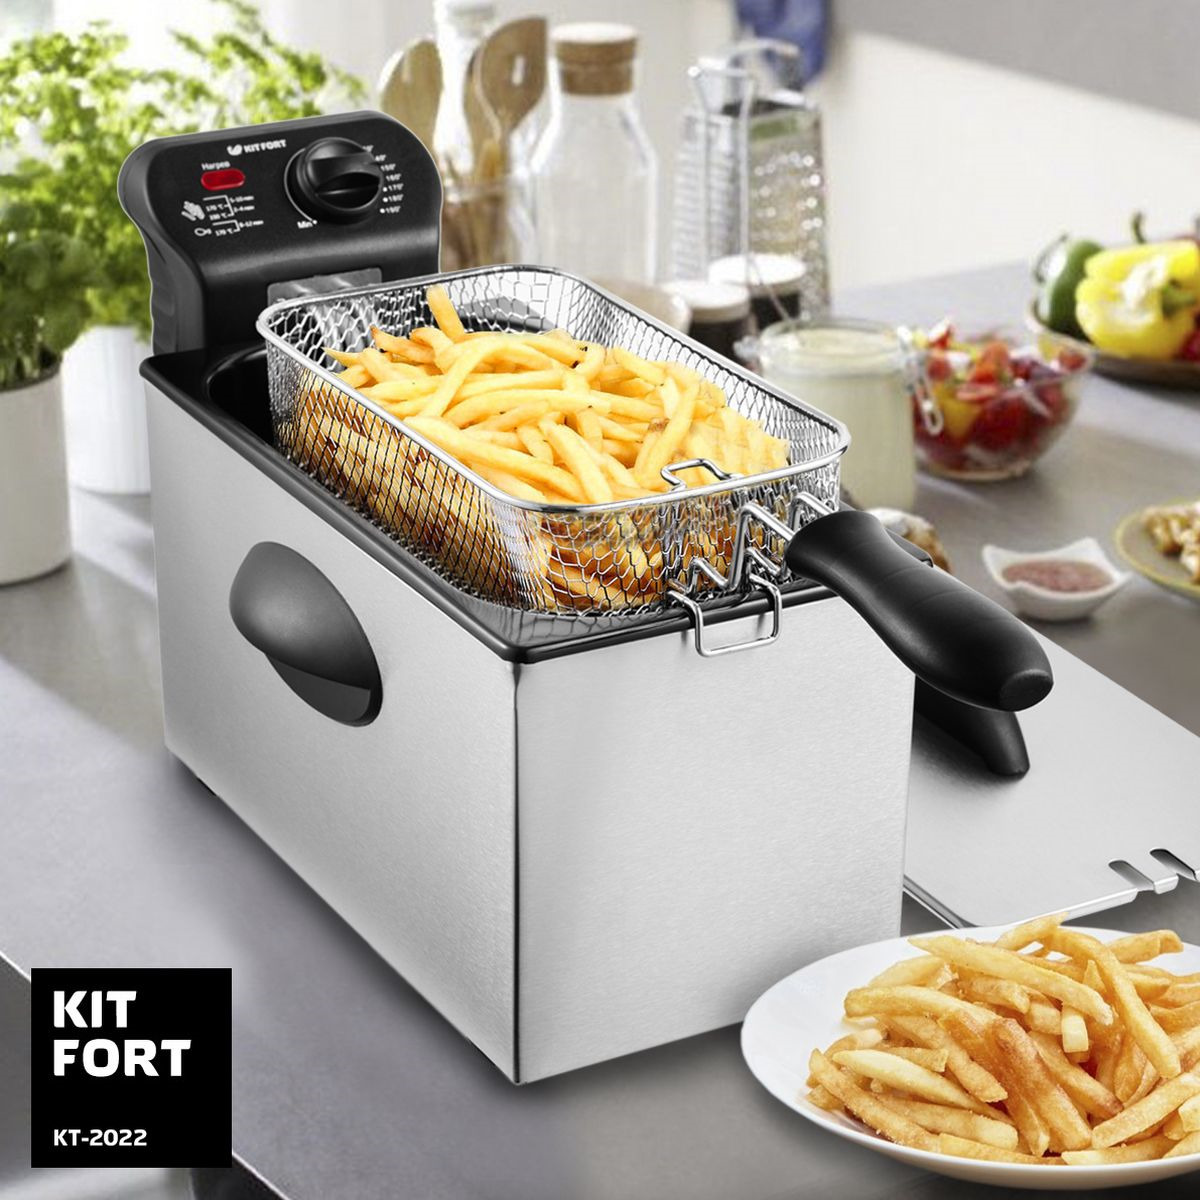 Фритюрница Kitfort, КТ-2022, серый металлик Kitfort